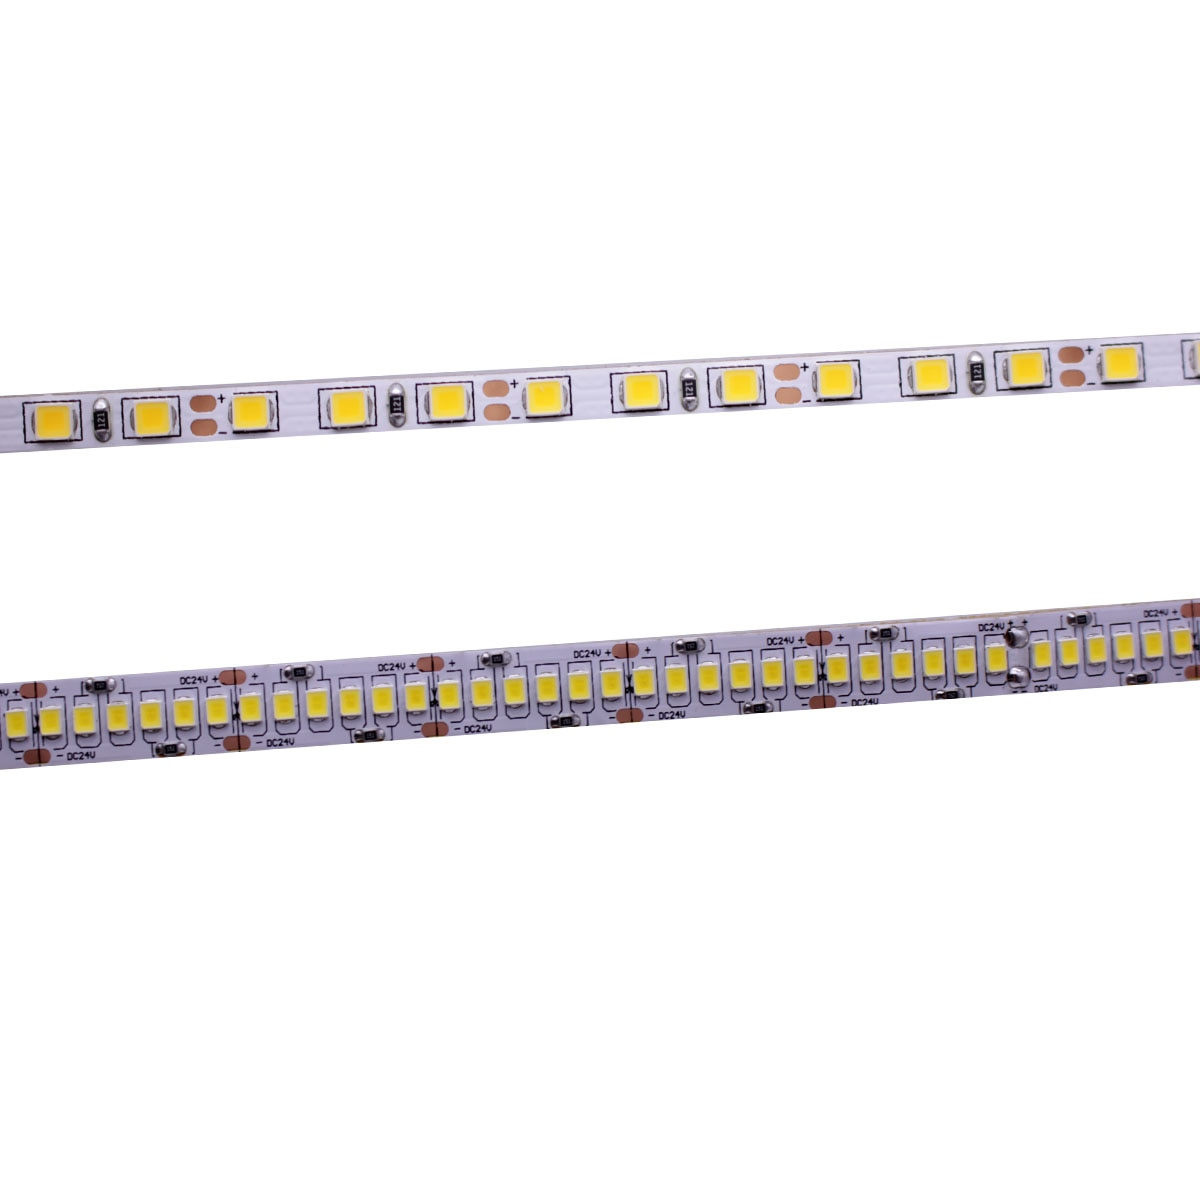 CRI 80 + 5 мм 10 мм PCB 12V 24V светодиодный 2835 120 светодиодный s 240 светодиодный s/m диод Гибкая световая лента 4000K 6000K Neutural белый теплый белый 5 м